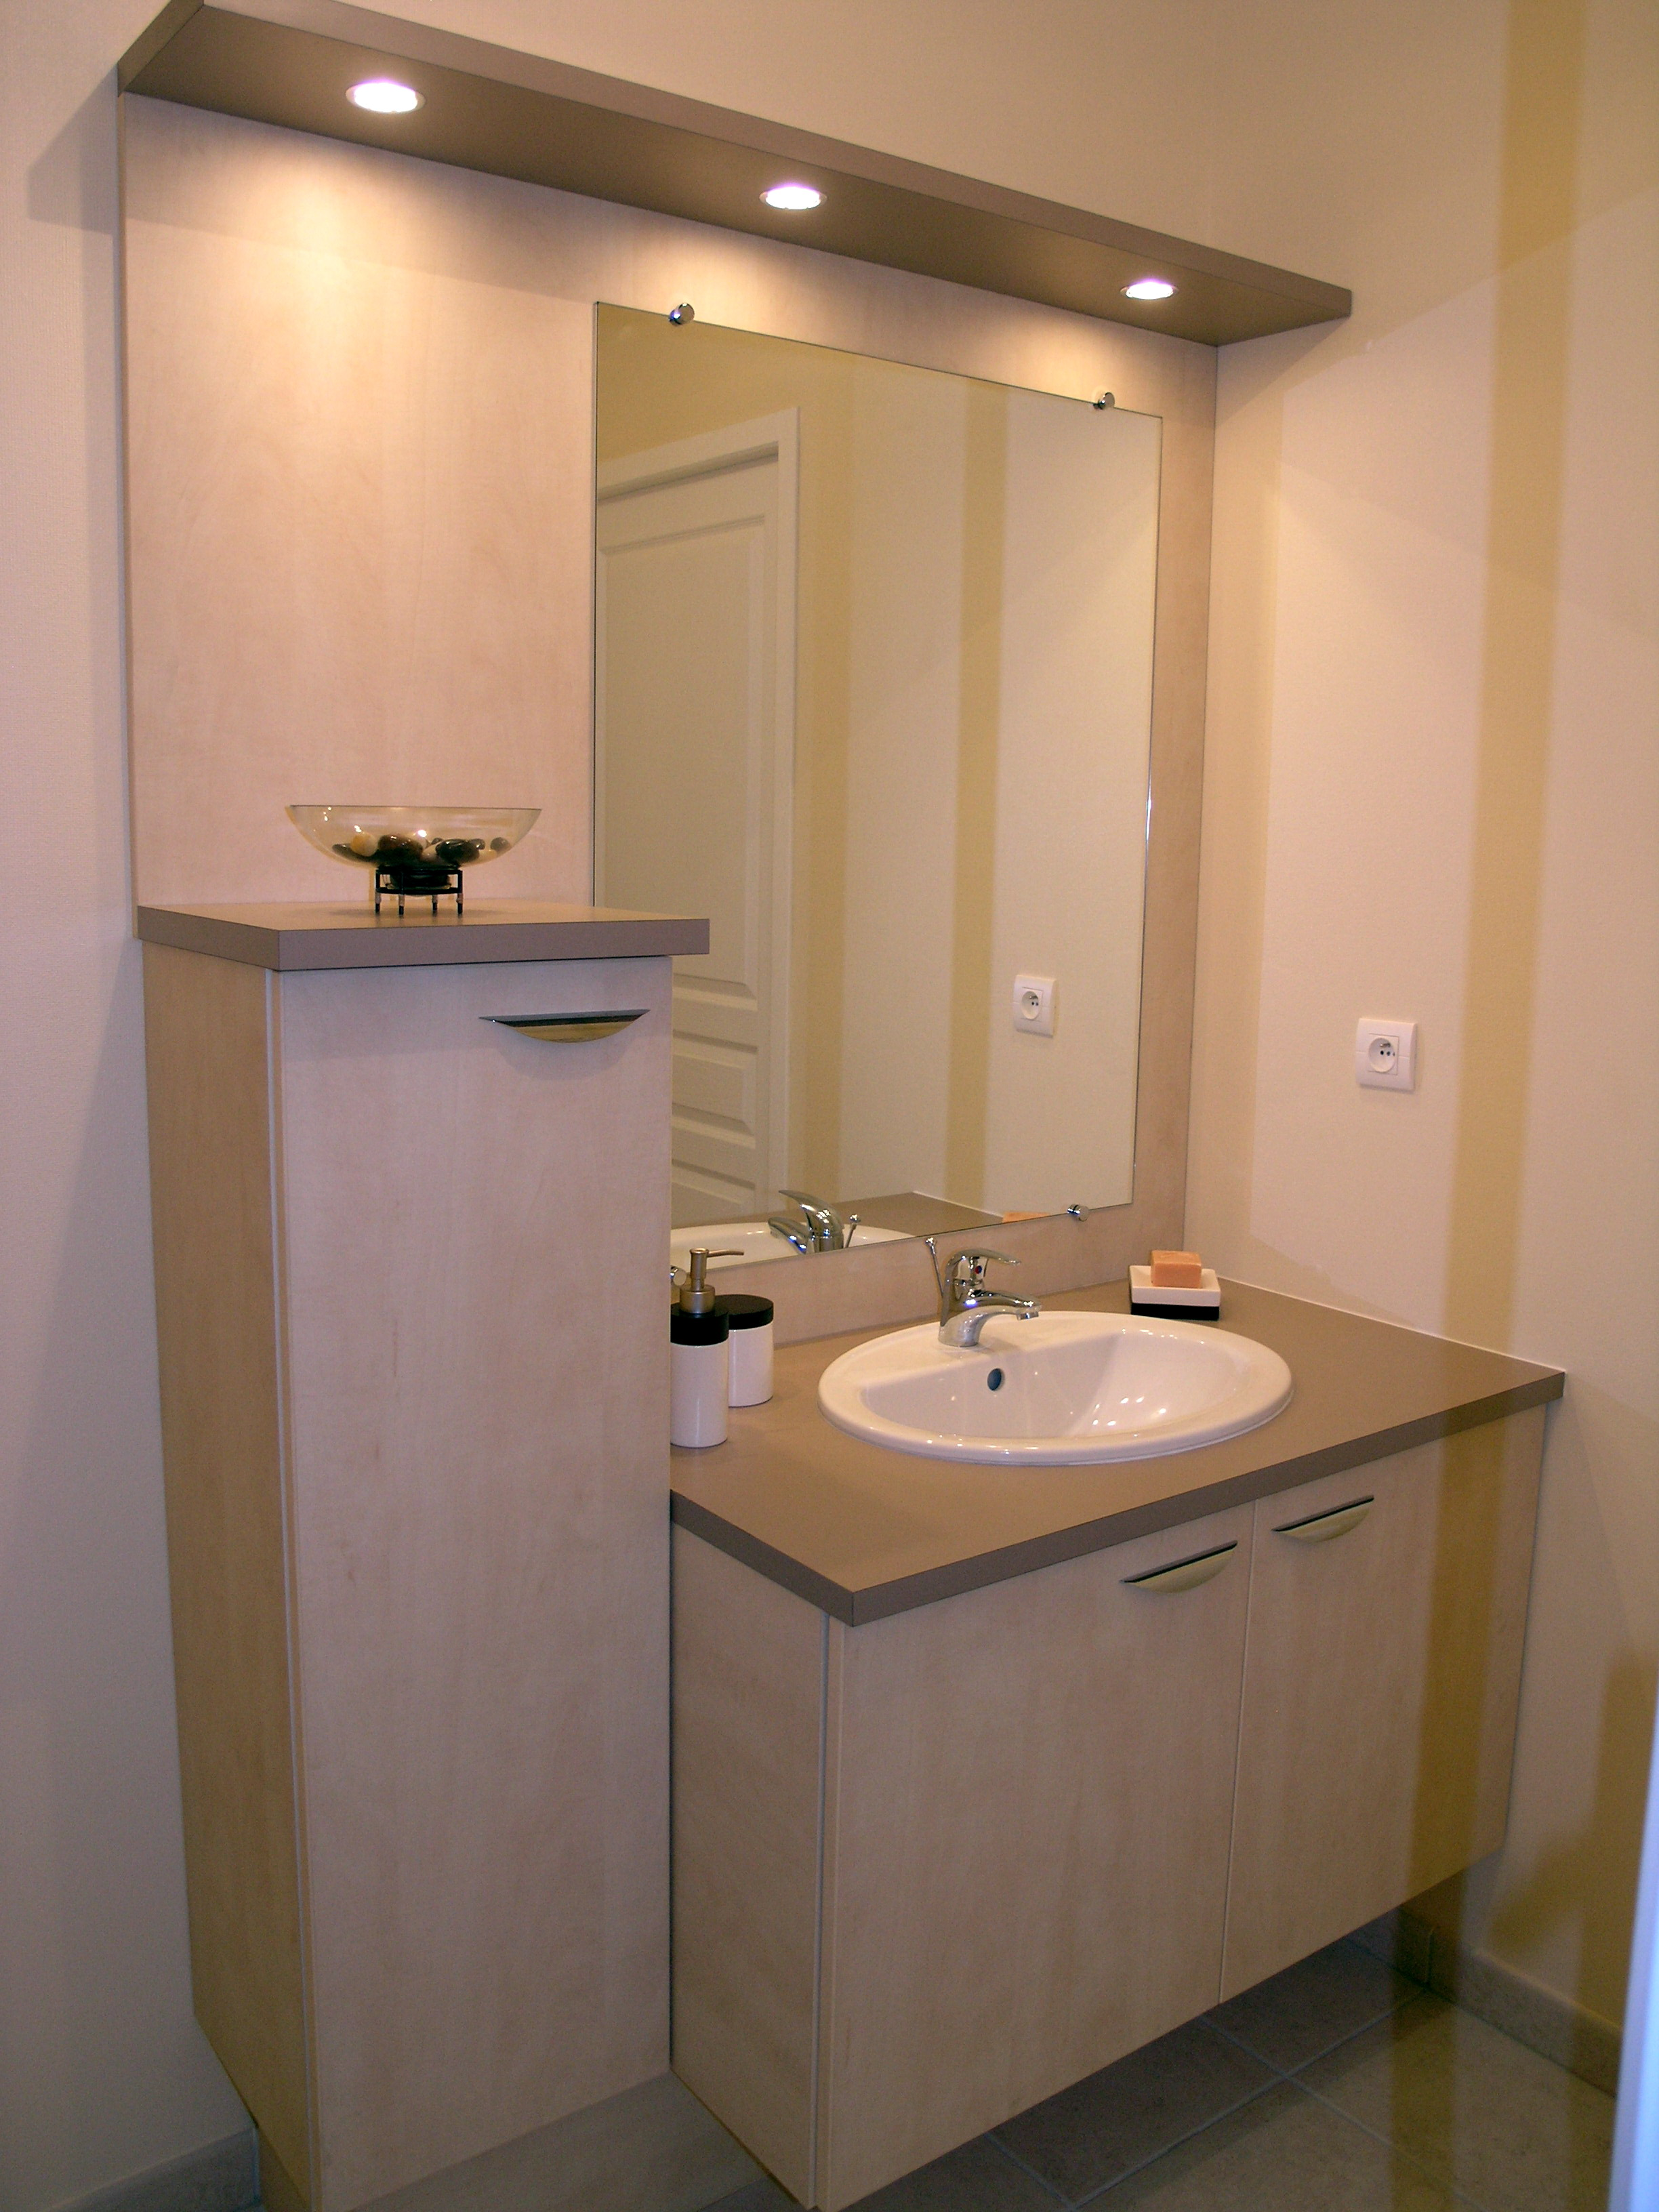 Emejing miroir salle de bain lumiere integree contemporary for Miroir salle de bain chauffant